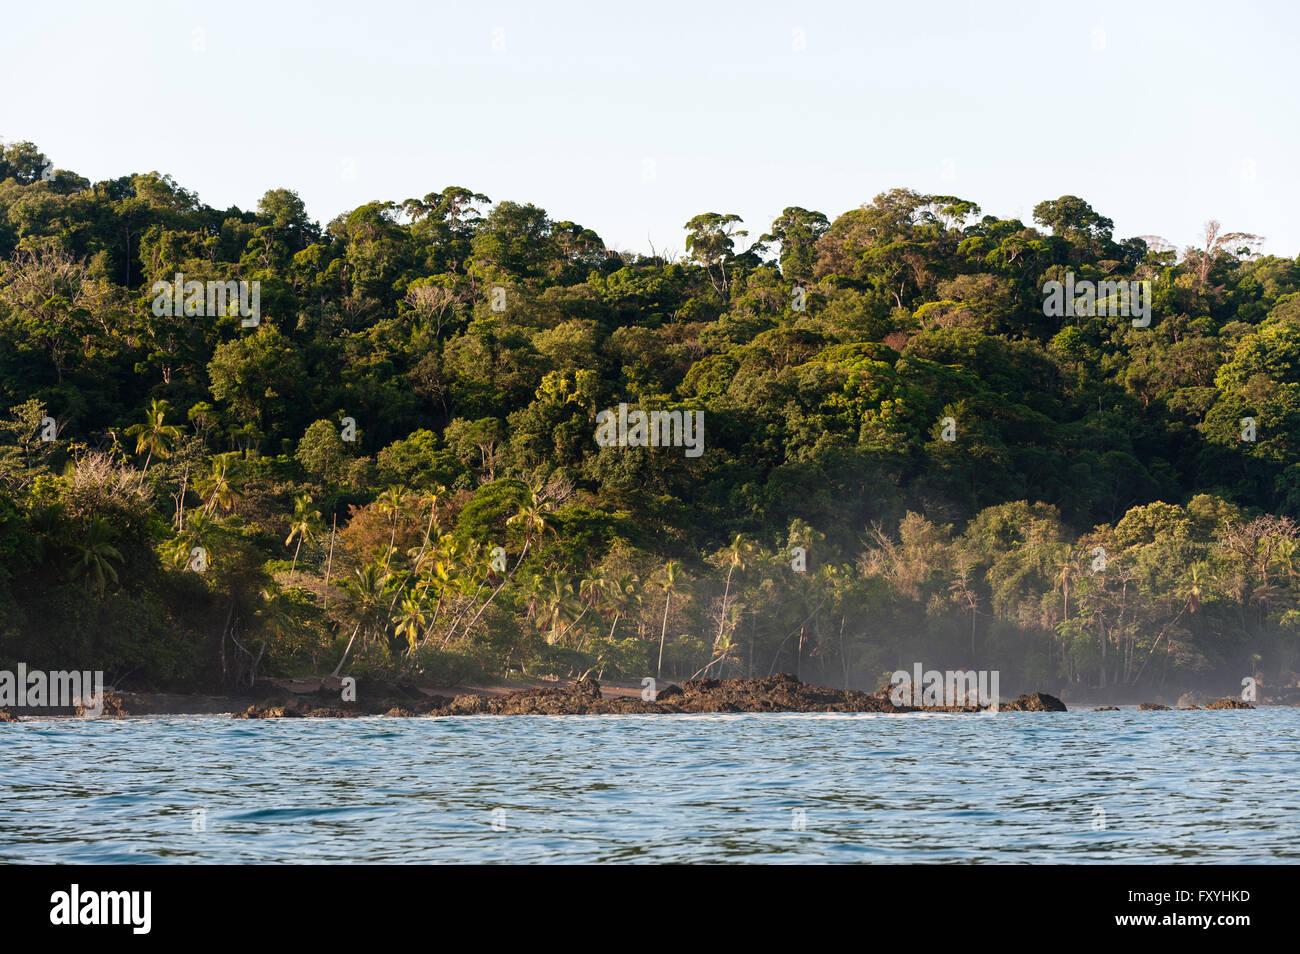 Corcovado National Park, Osa peninsula, Costa Rica - Stock Image